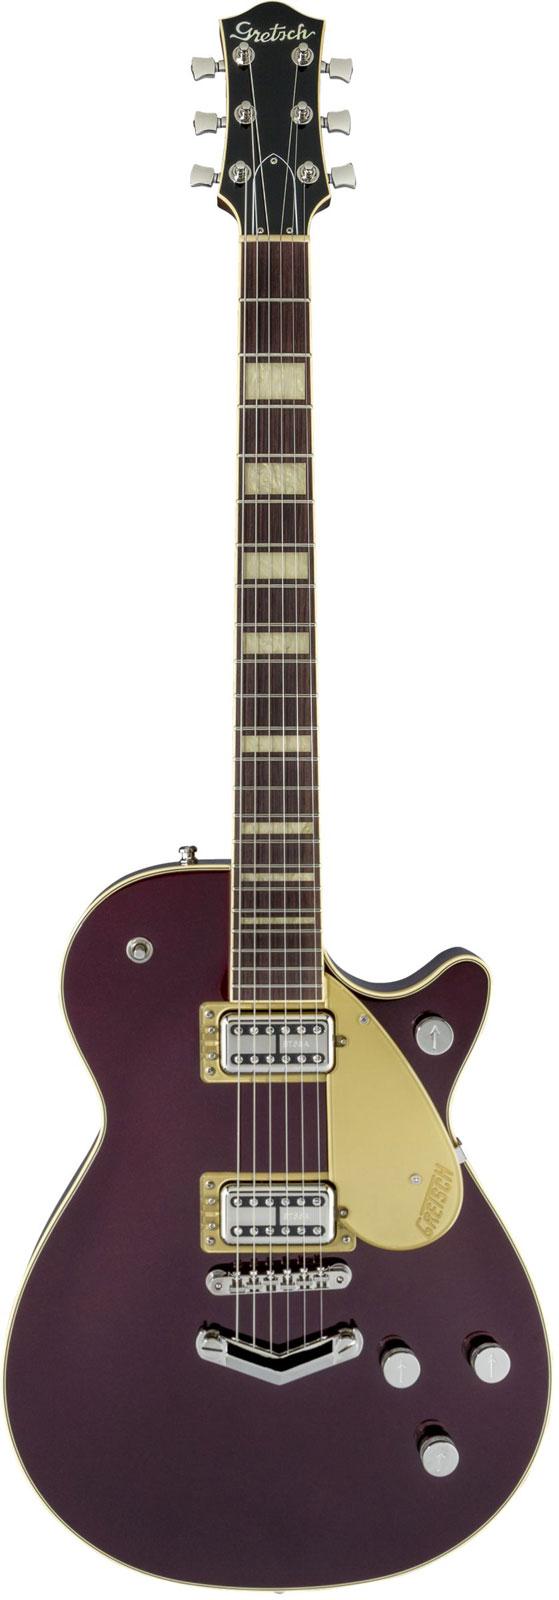 Gretsch Guitars G6228 Players Edition Jet Bt With V-stoptail Rw Dark Cherry Metallic